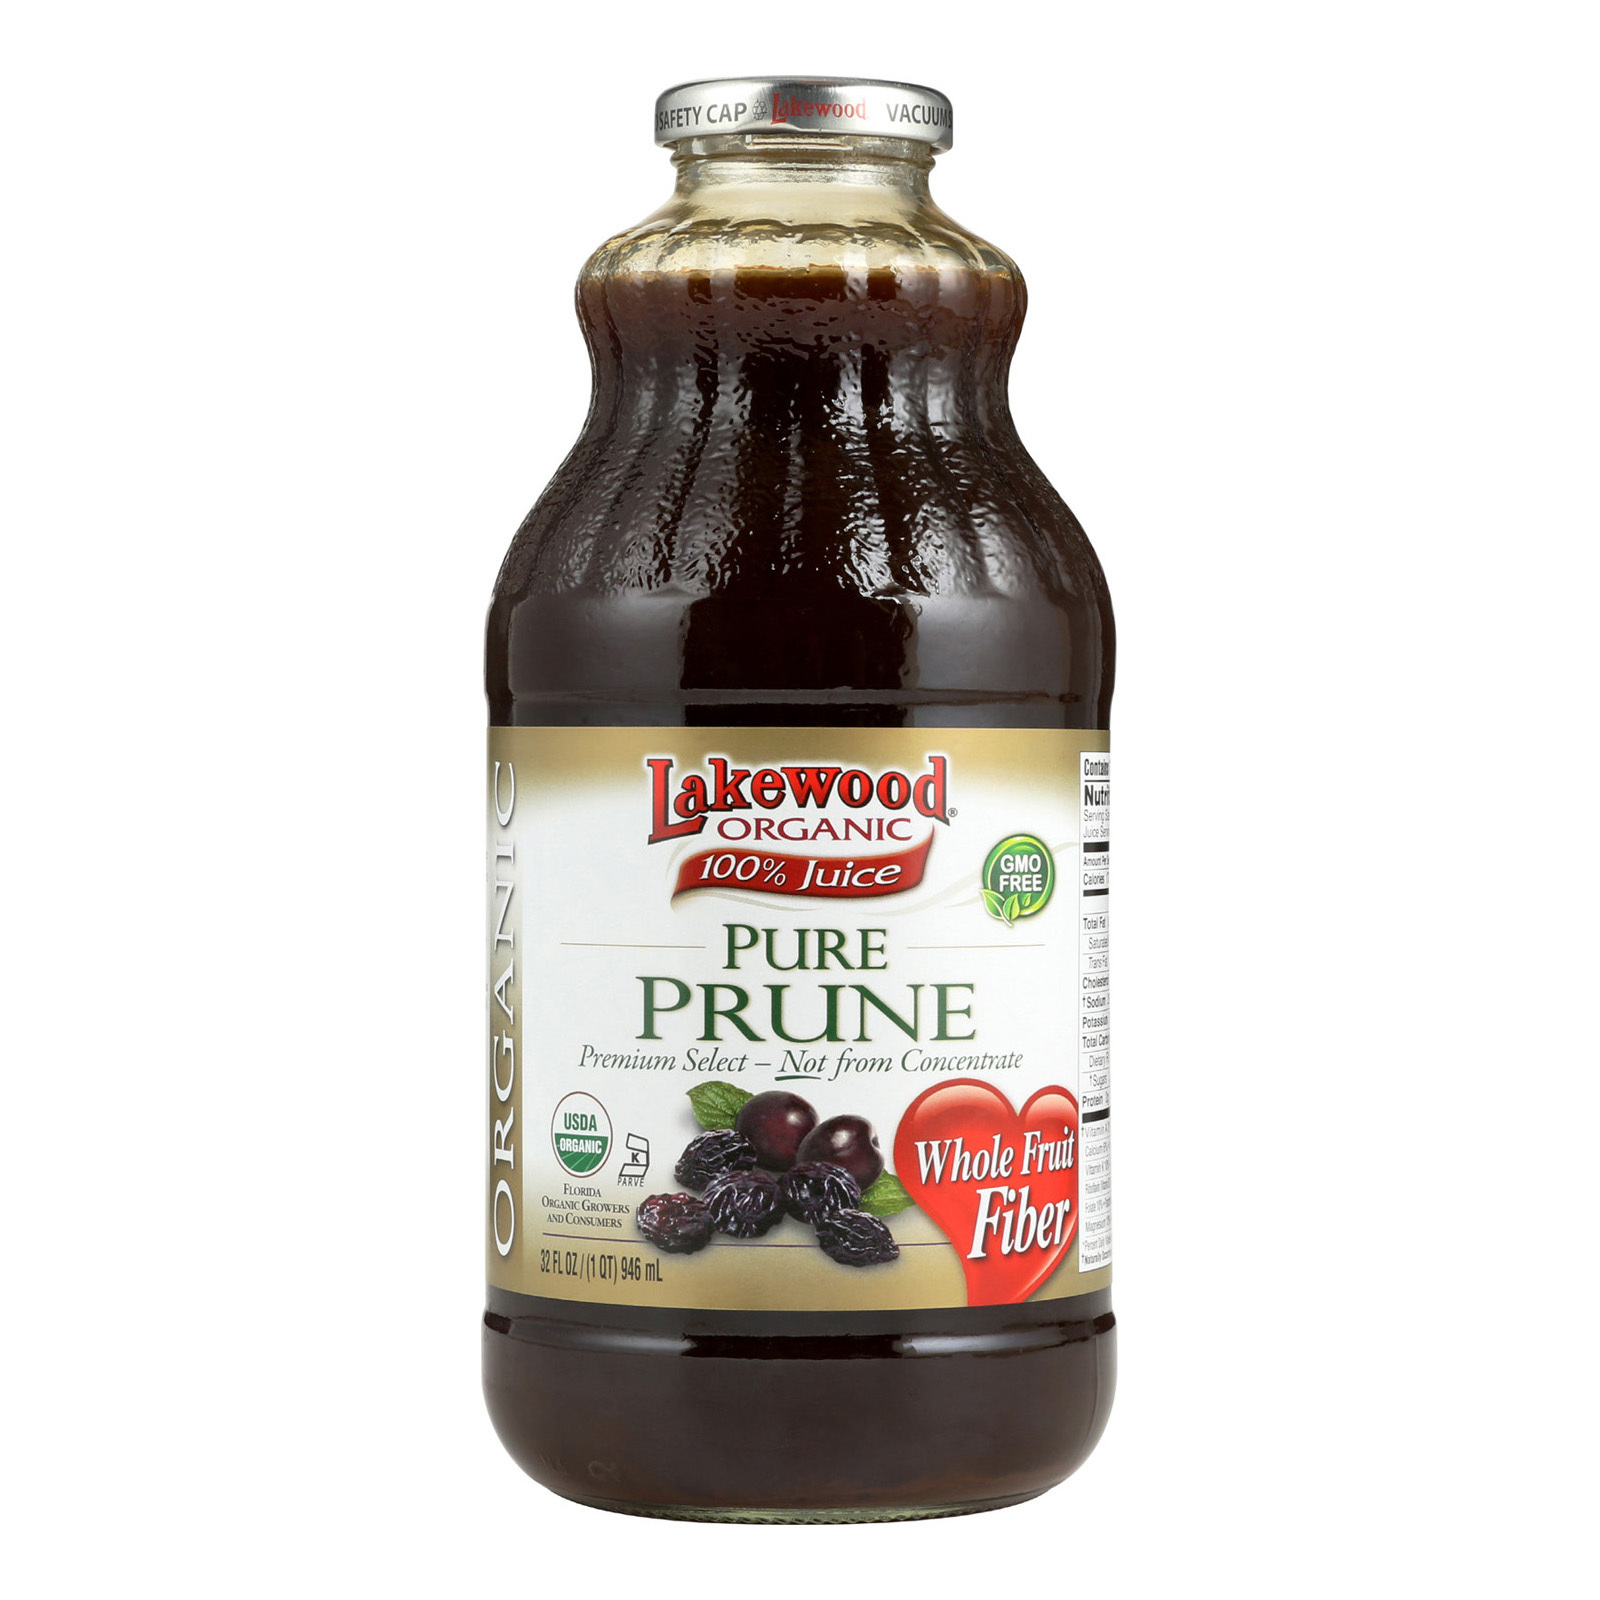 Lakewood Pure Prune - Prune - Case of 12 - 32 Fl oz.